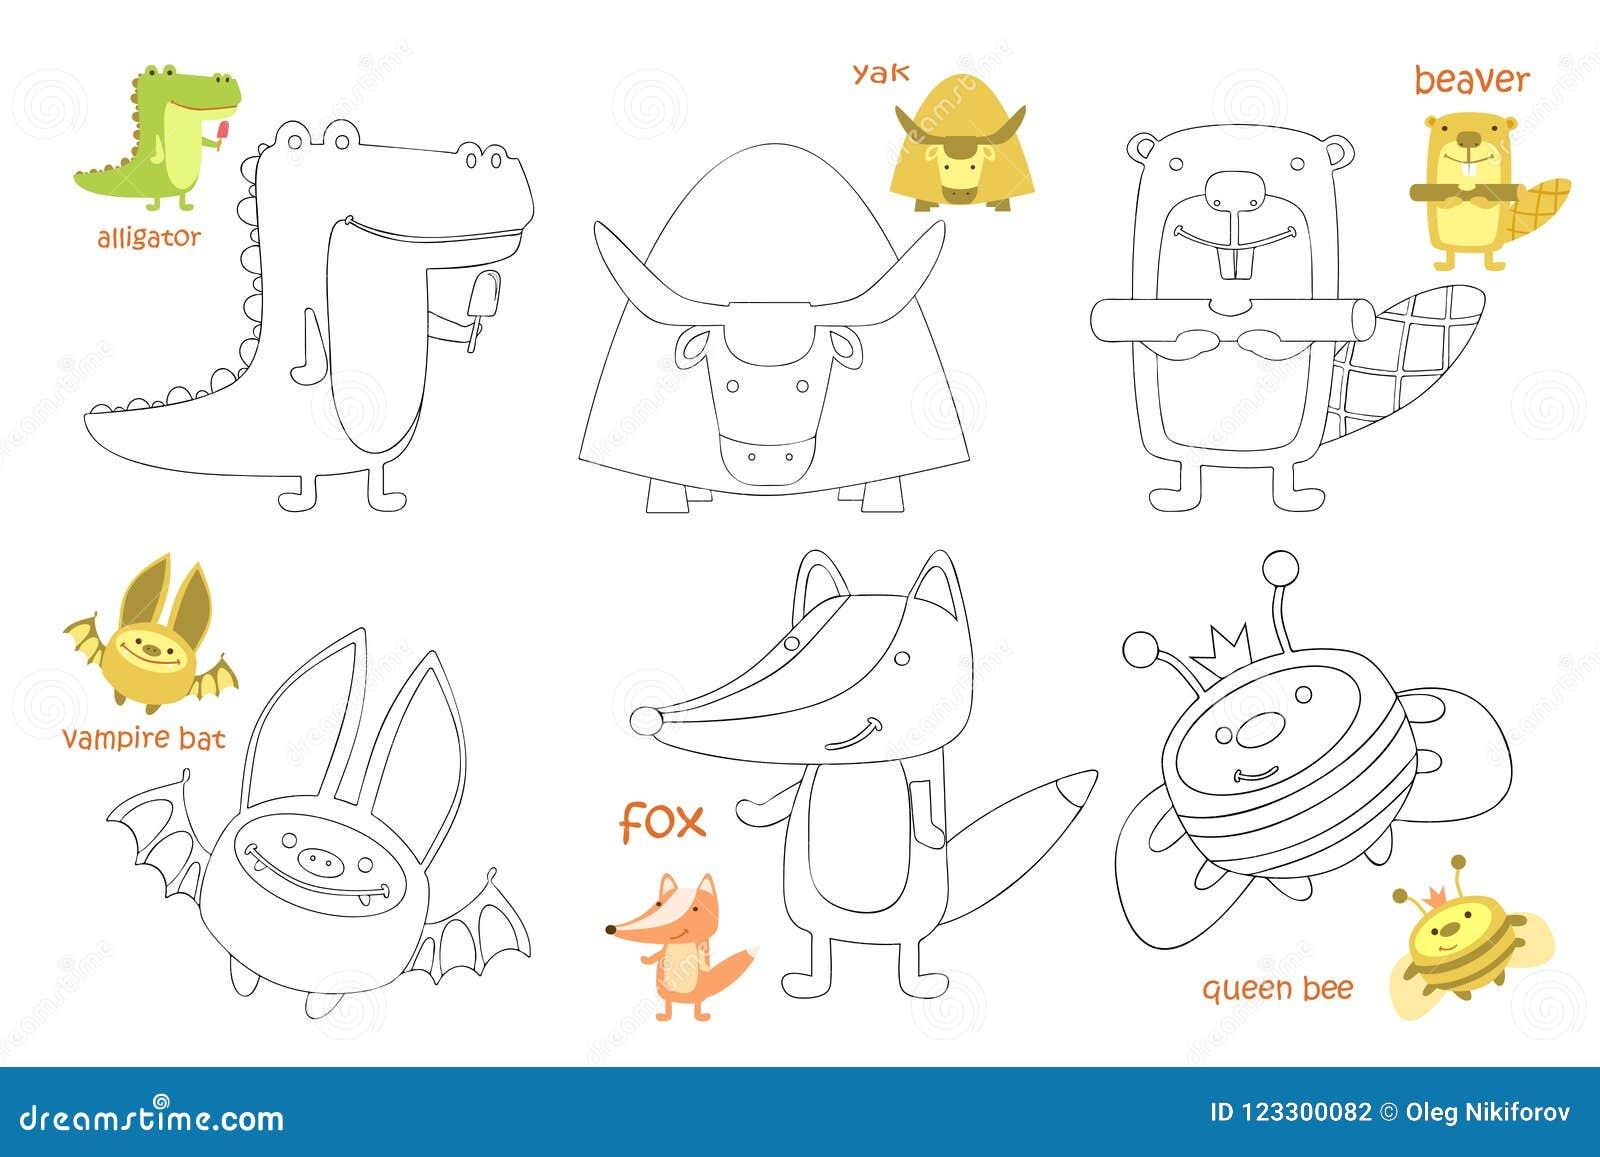 kids coloring page set kids coloring page coloring book animal doodle vector illustration